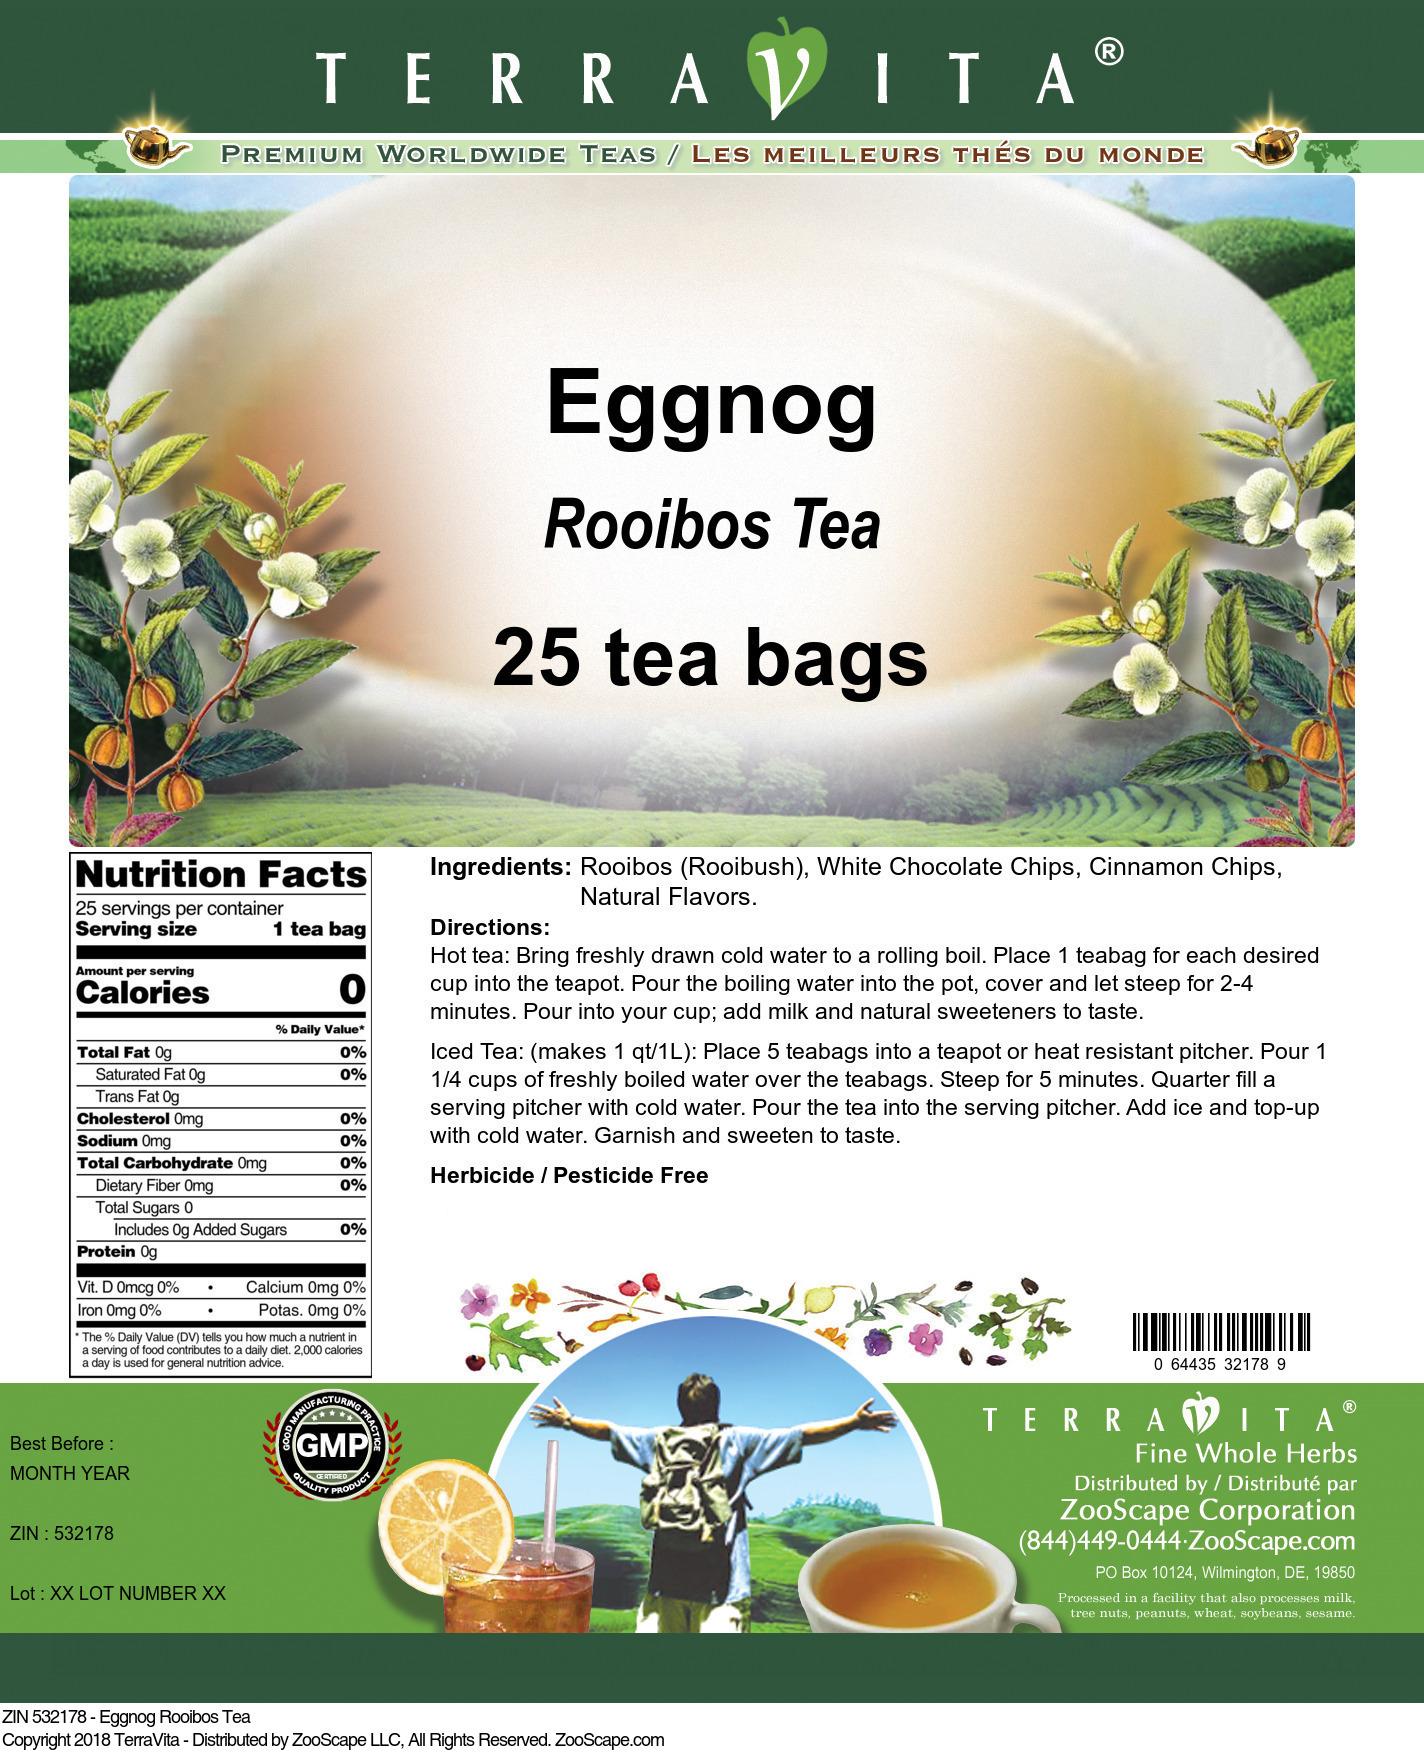 Eggnog Rooibos Tea